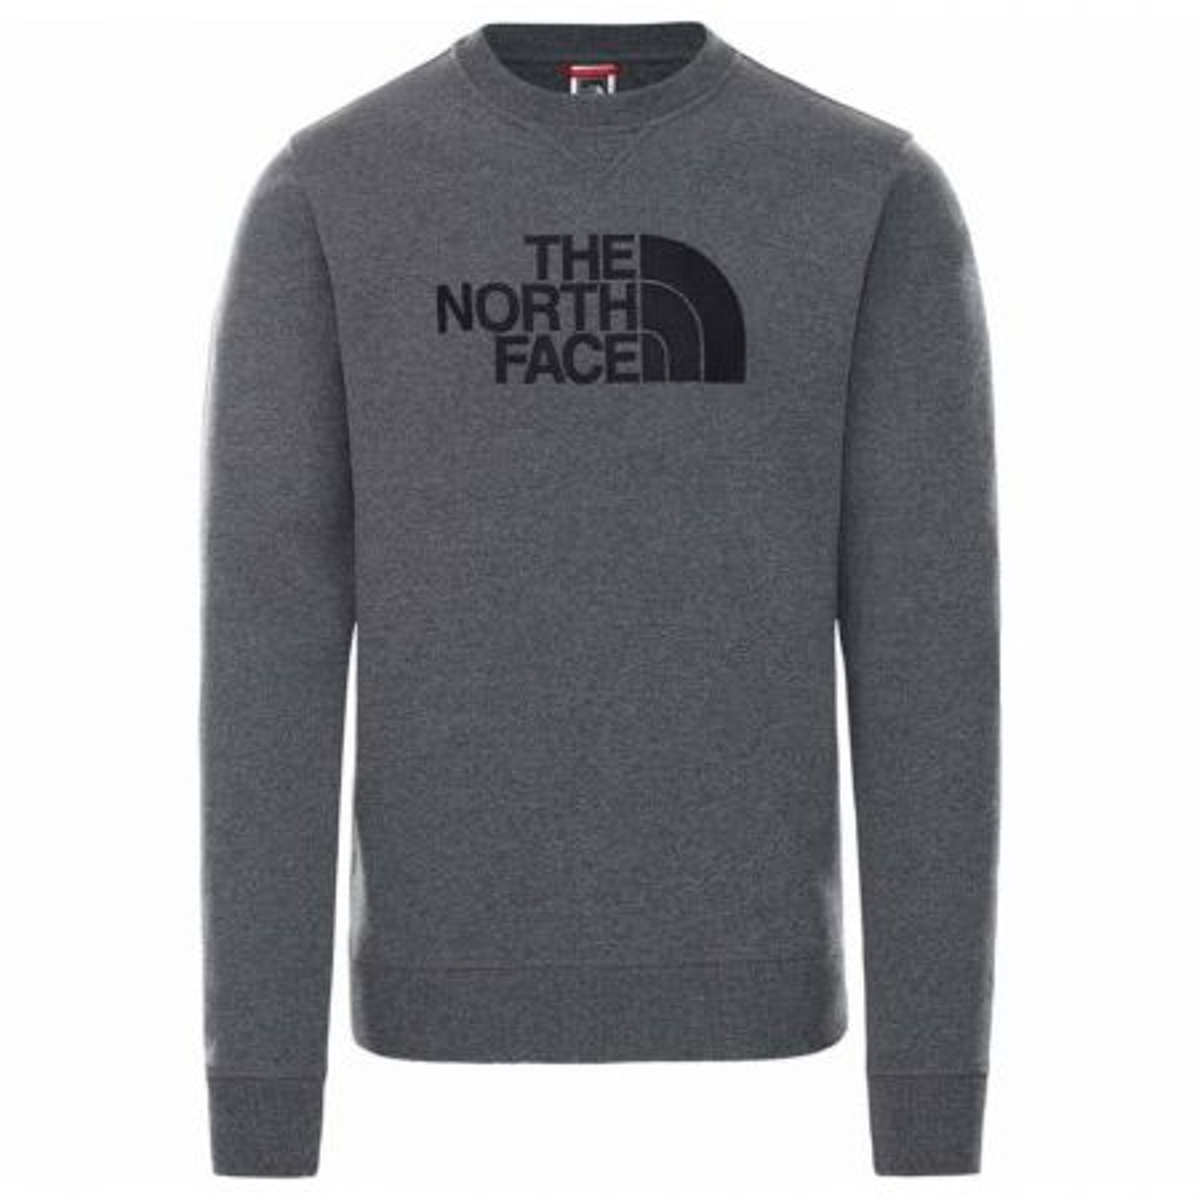 The North Face Drew Peak majica